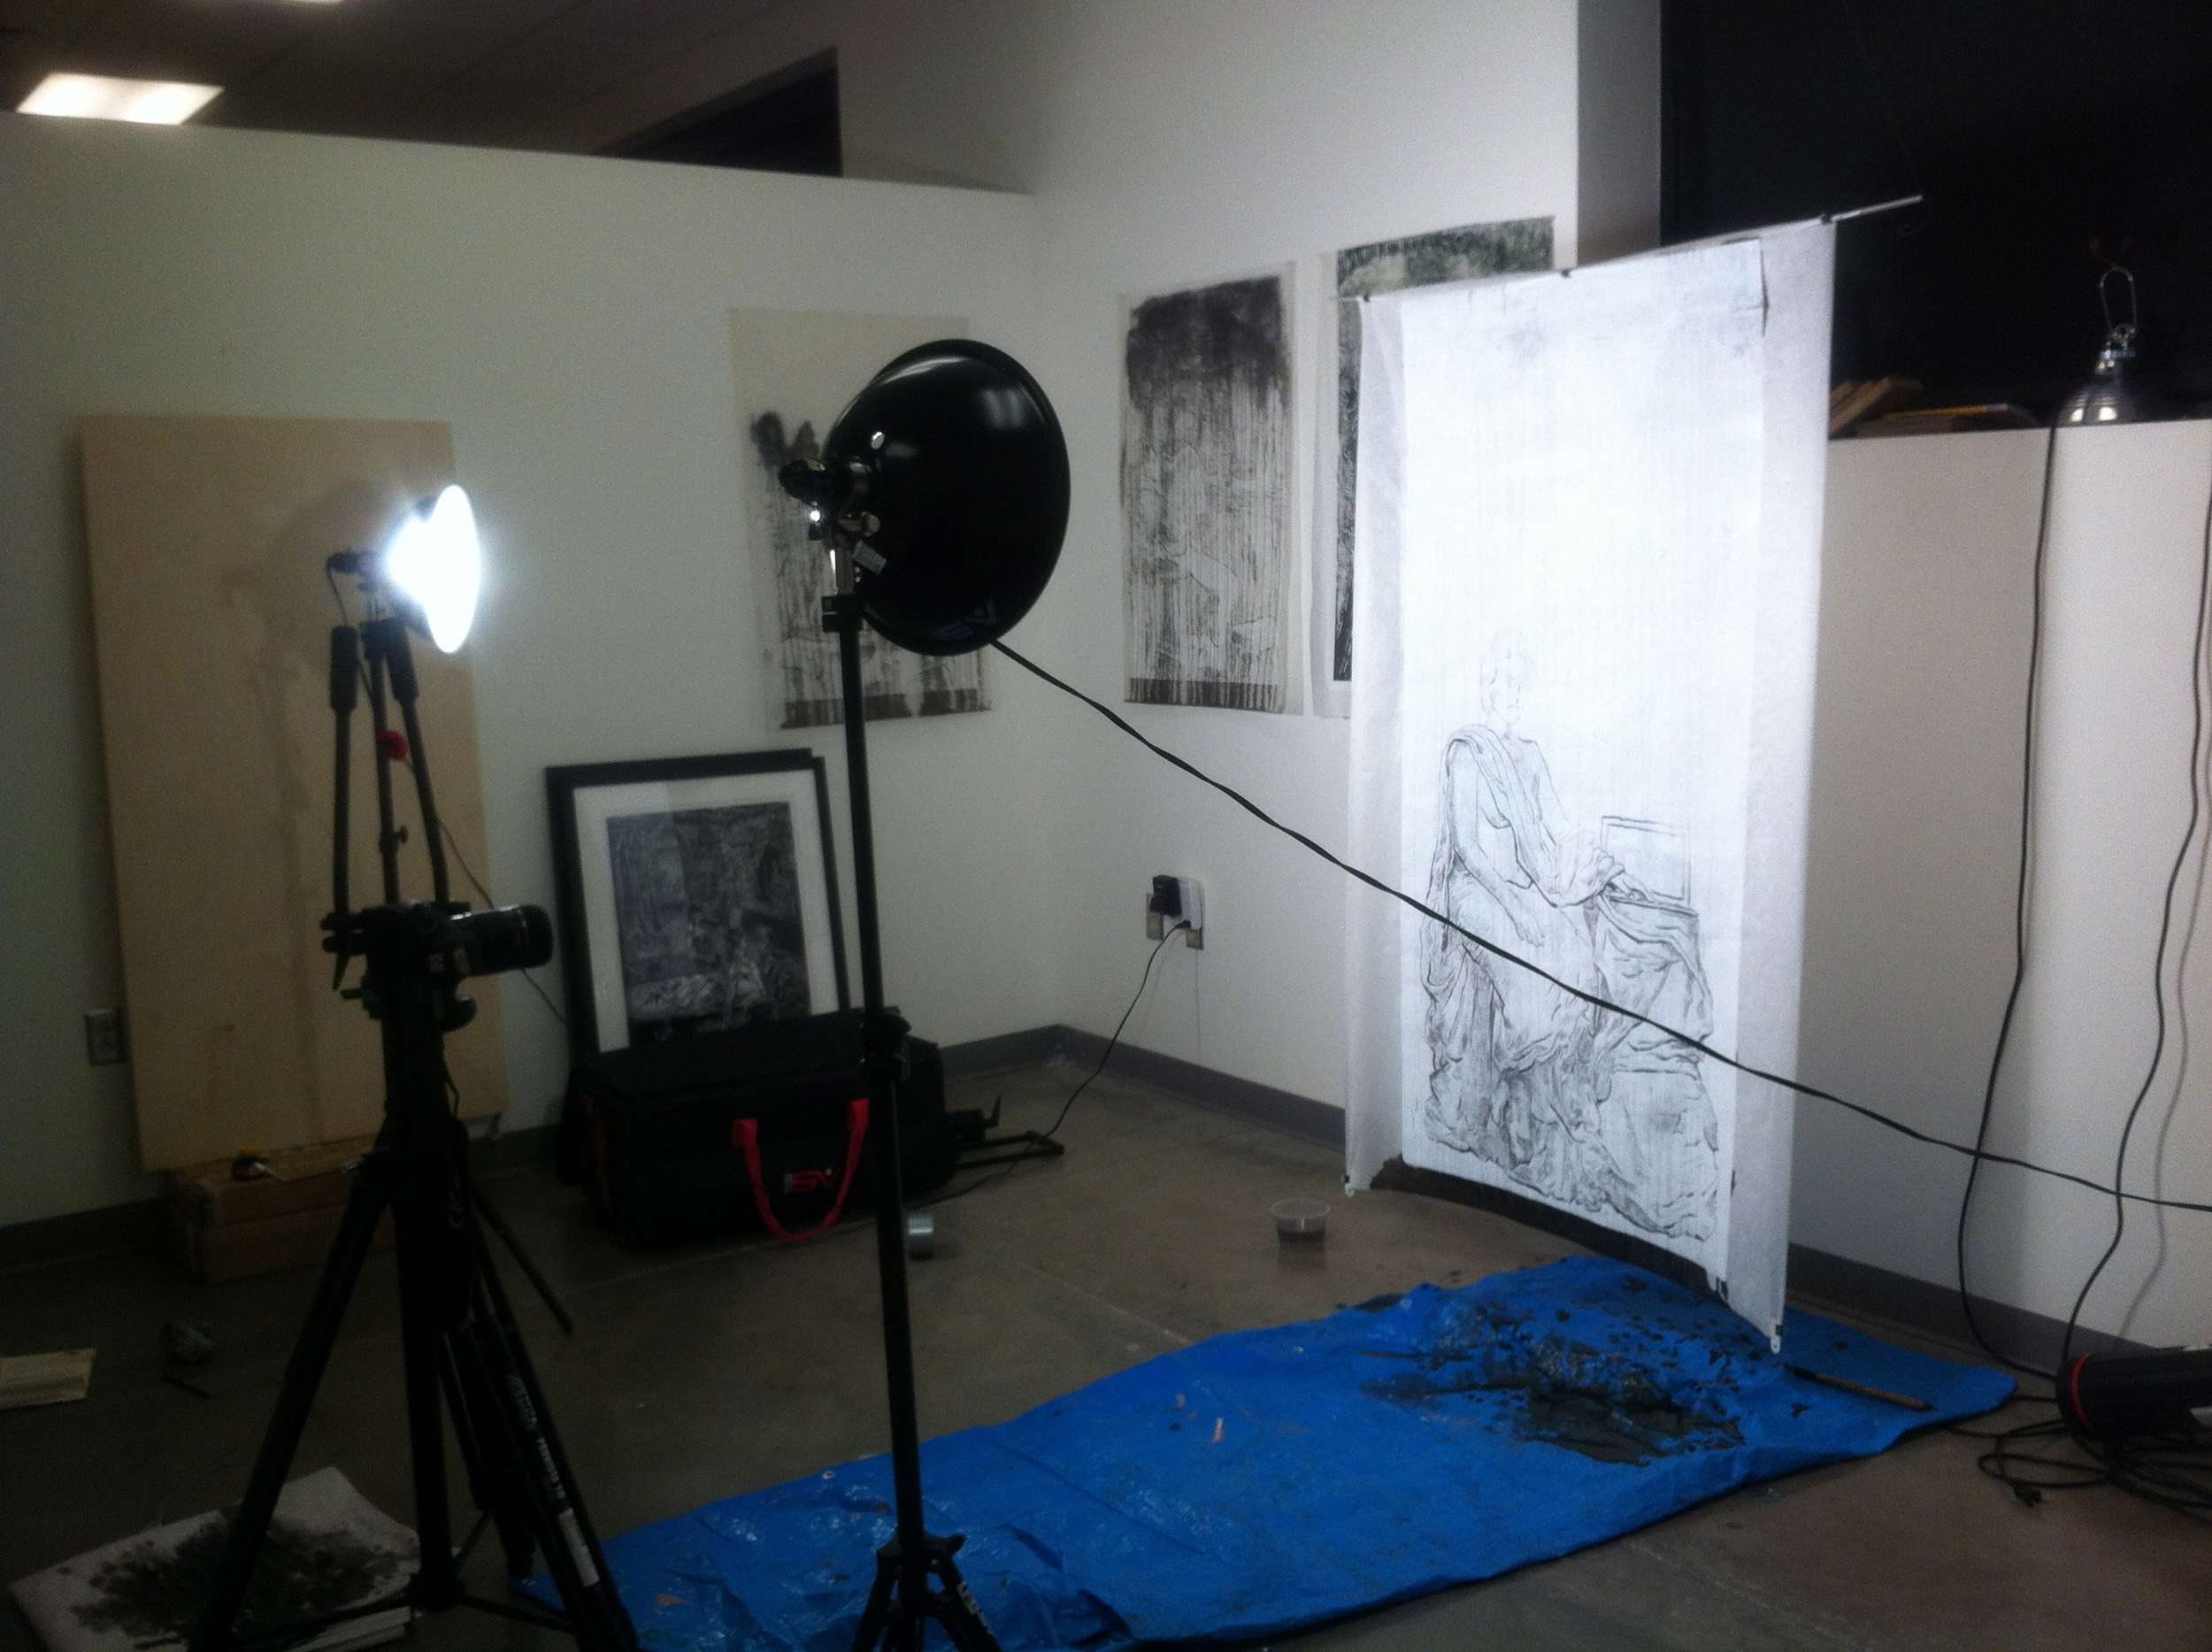 Late at Nite Art making!